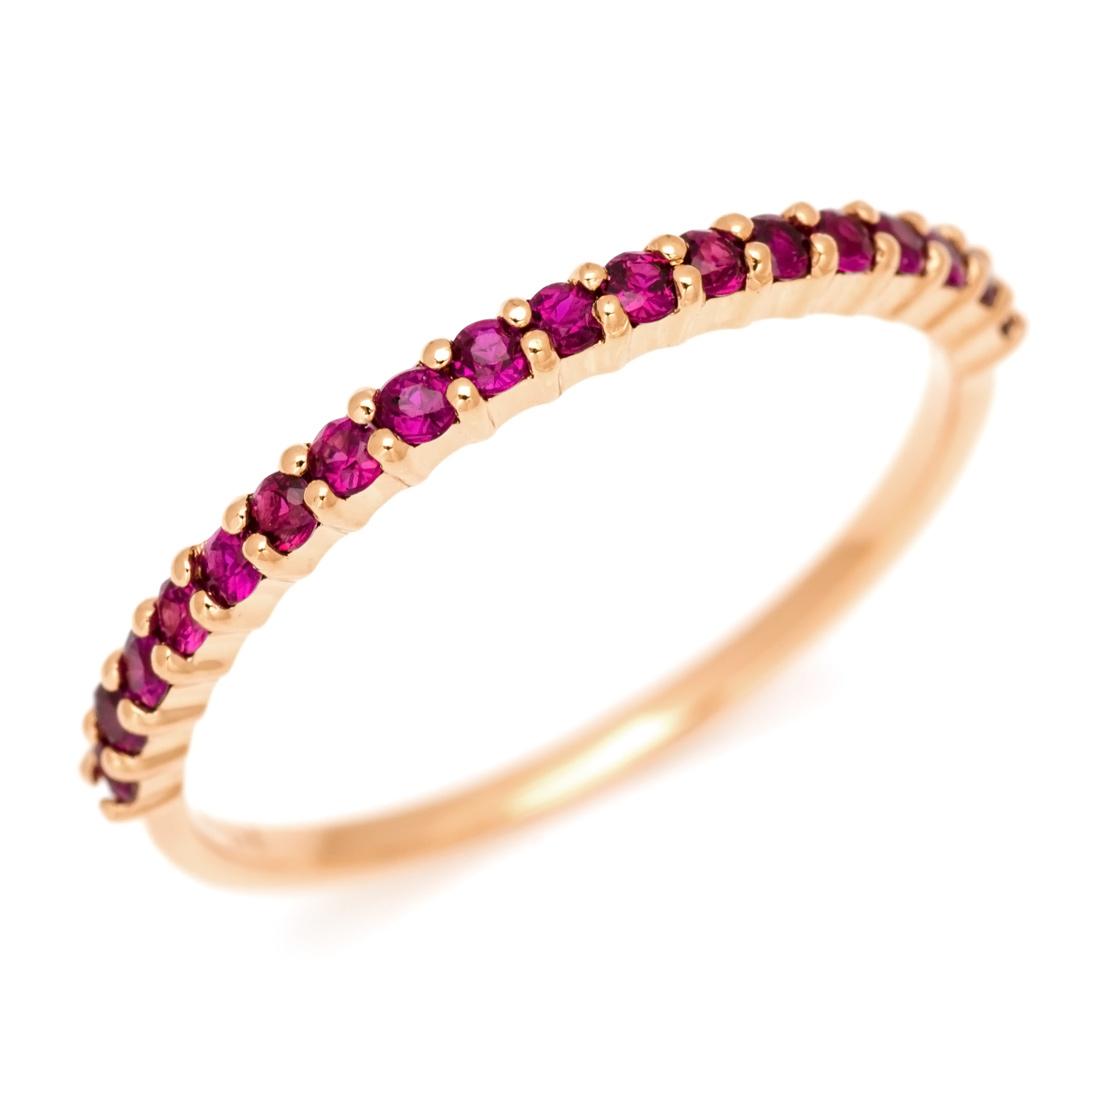 K18 ルビー エタニティ リング 「fila」 指輪 ゴールド 18K 18金 エタニティー 誕生日 7月誕生石 メッセージ ギフト 贈り物 ピンキーリング対応可能